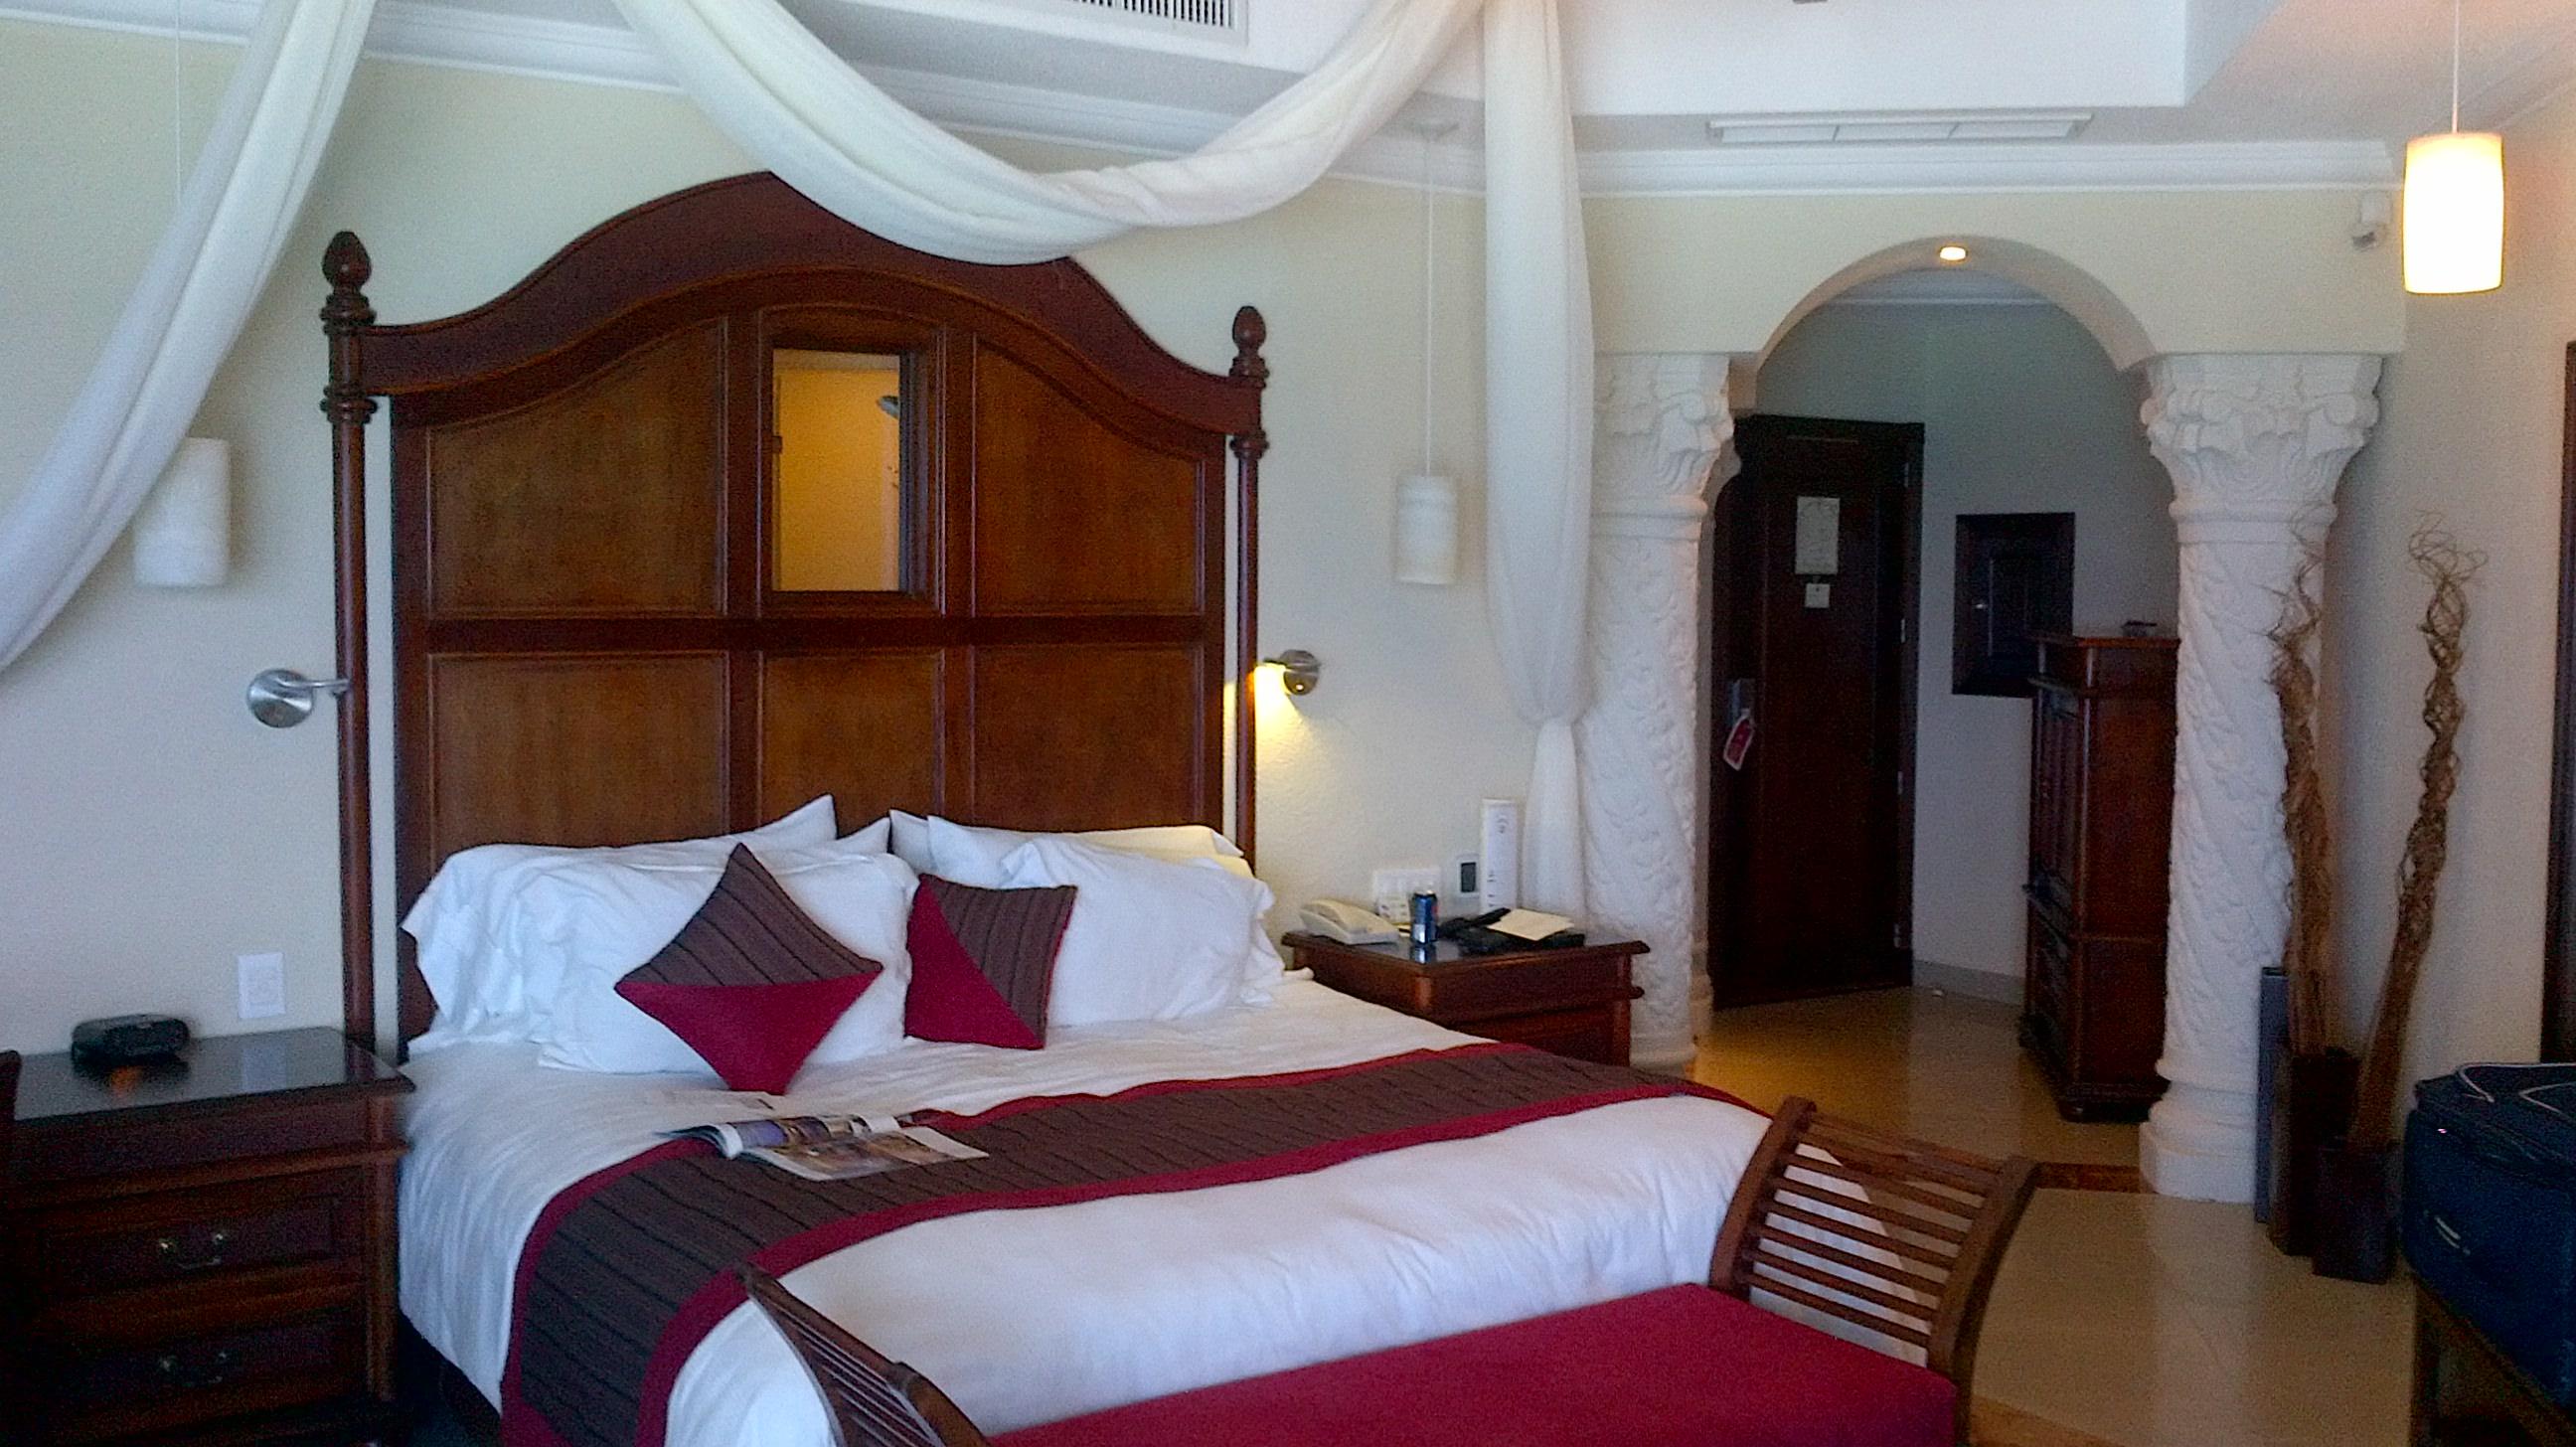 Riu Palace Peninsula Uniglobe Carefree Travel S Blog